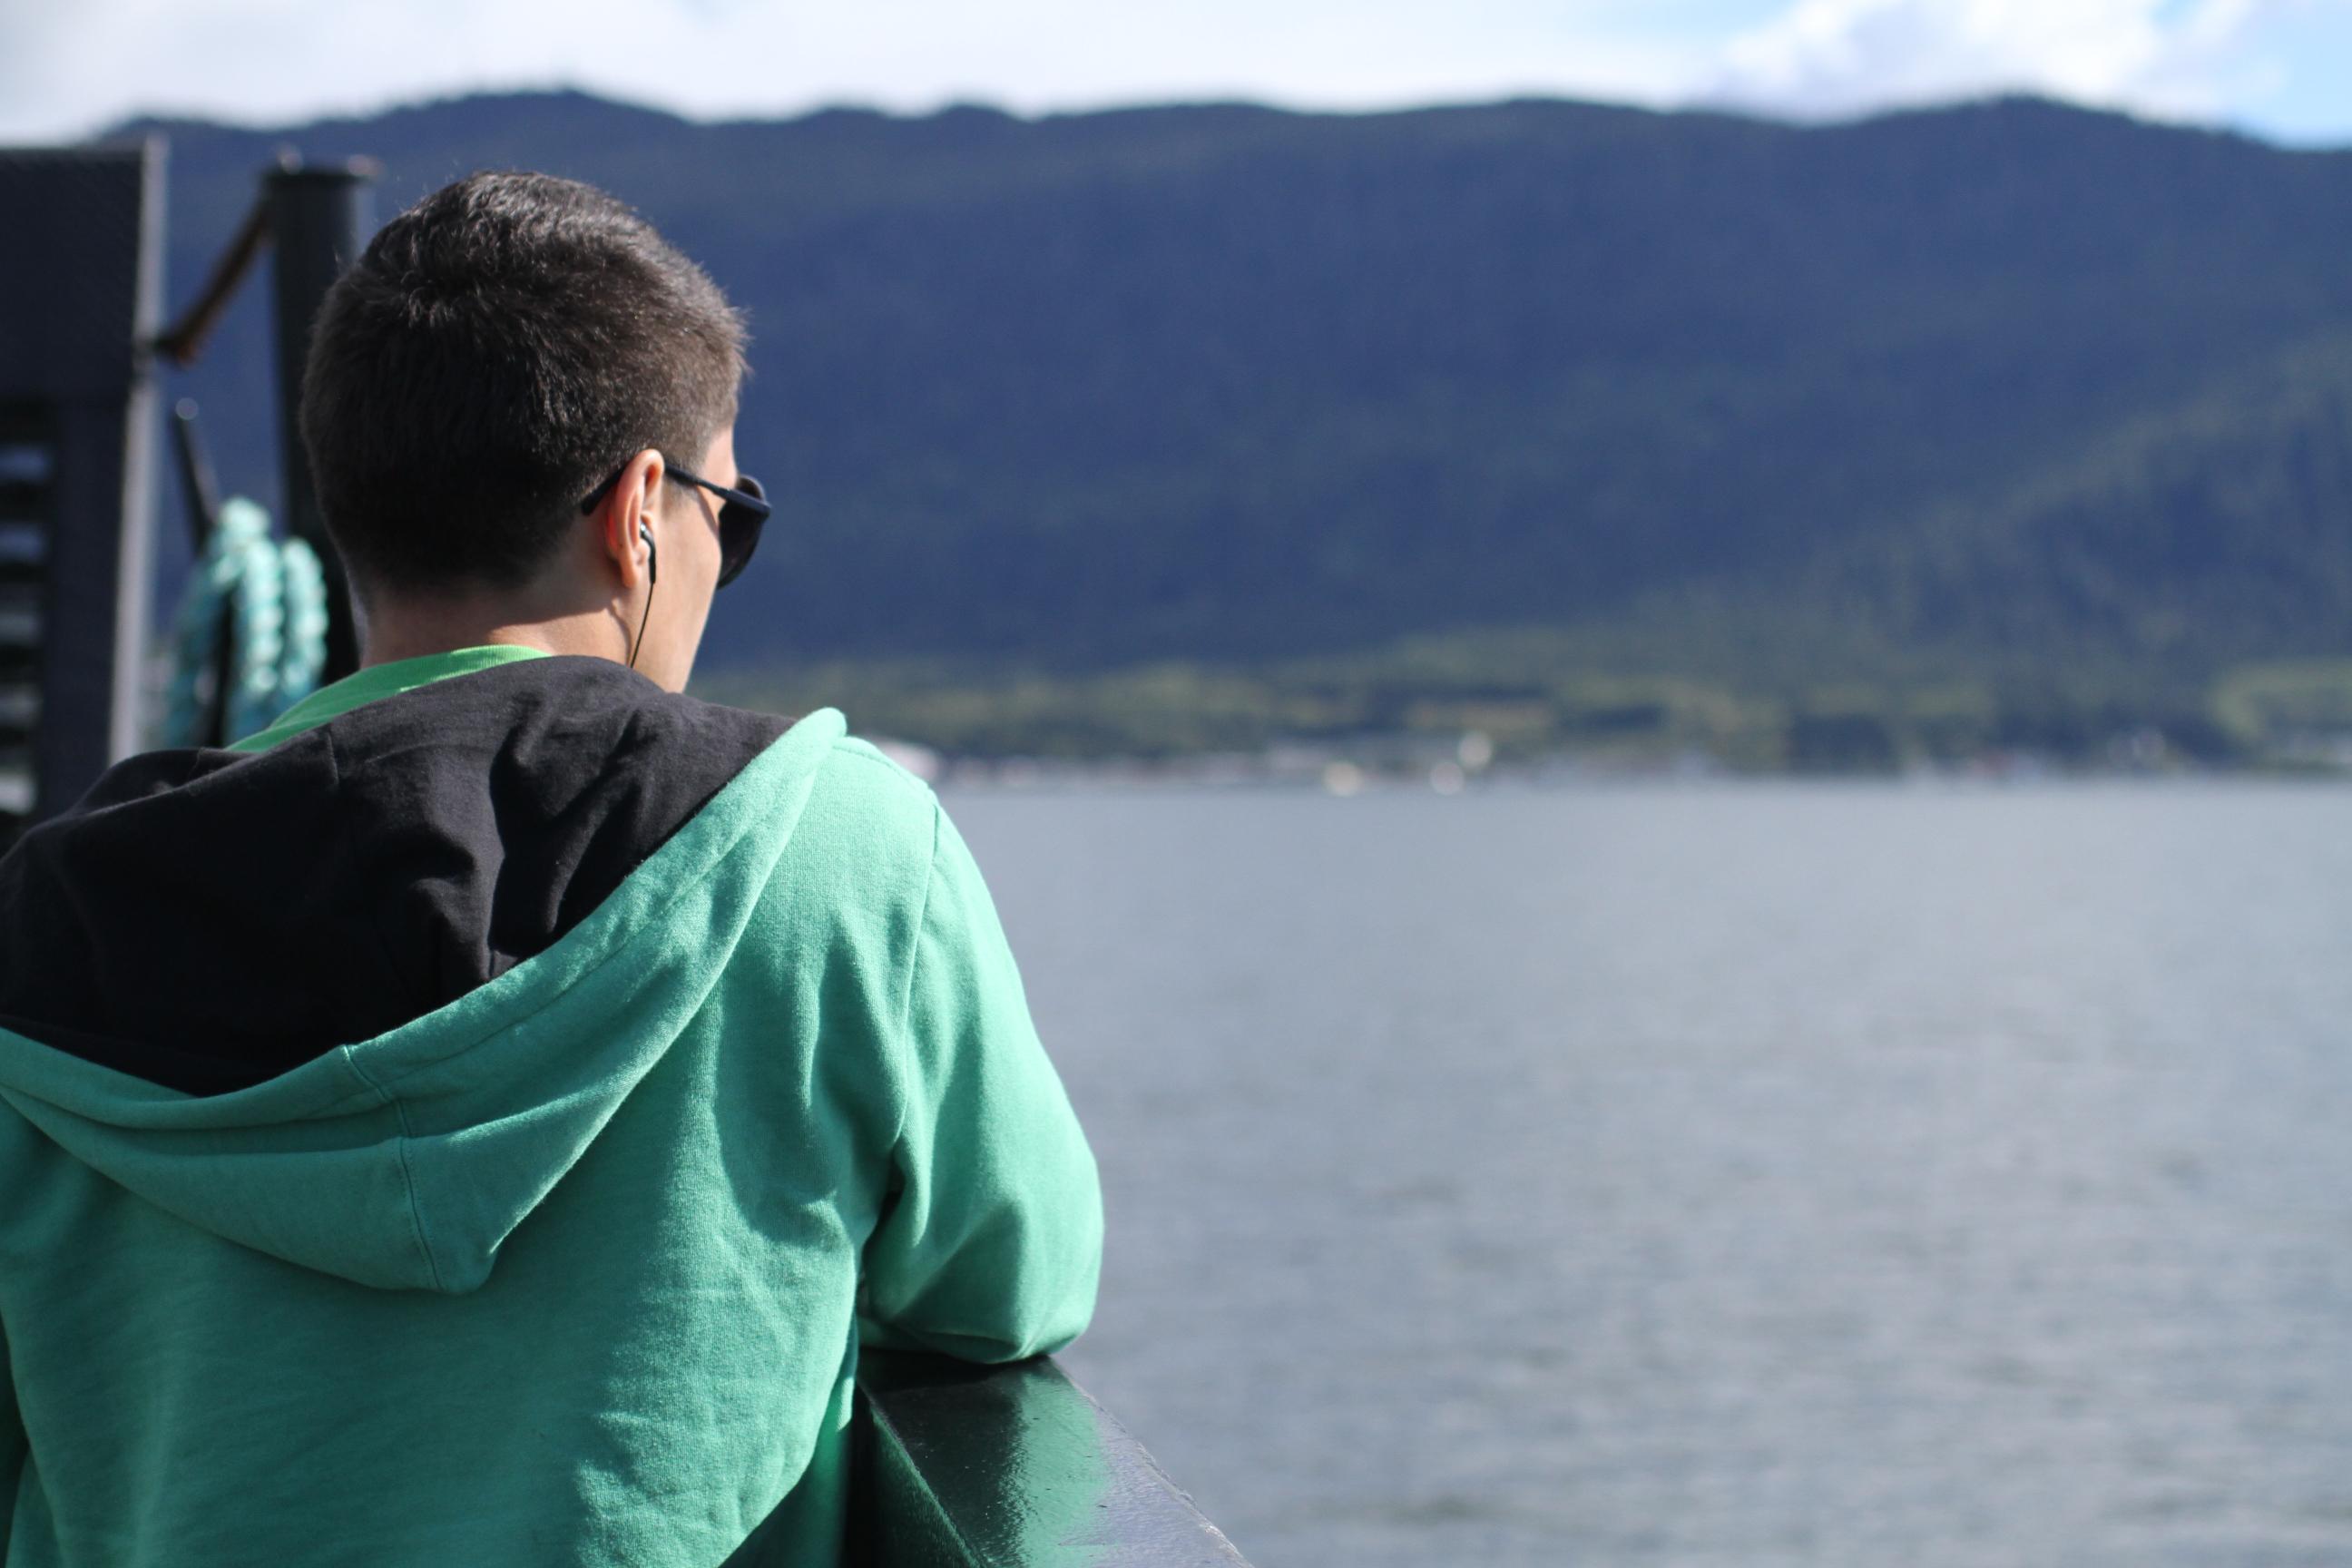 Prince Rupert, BC